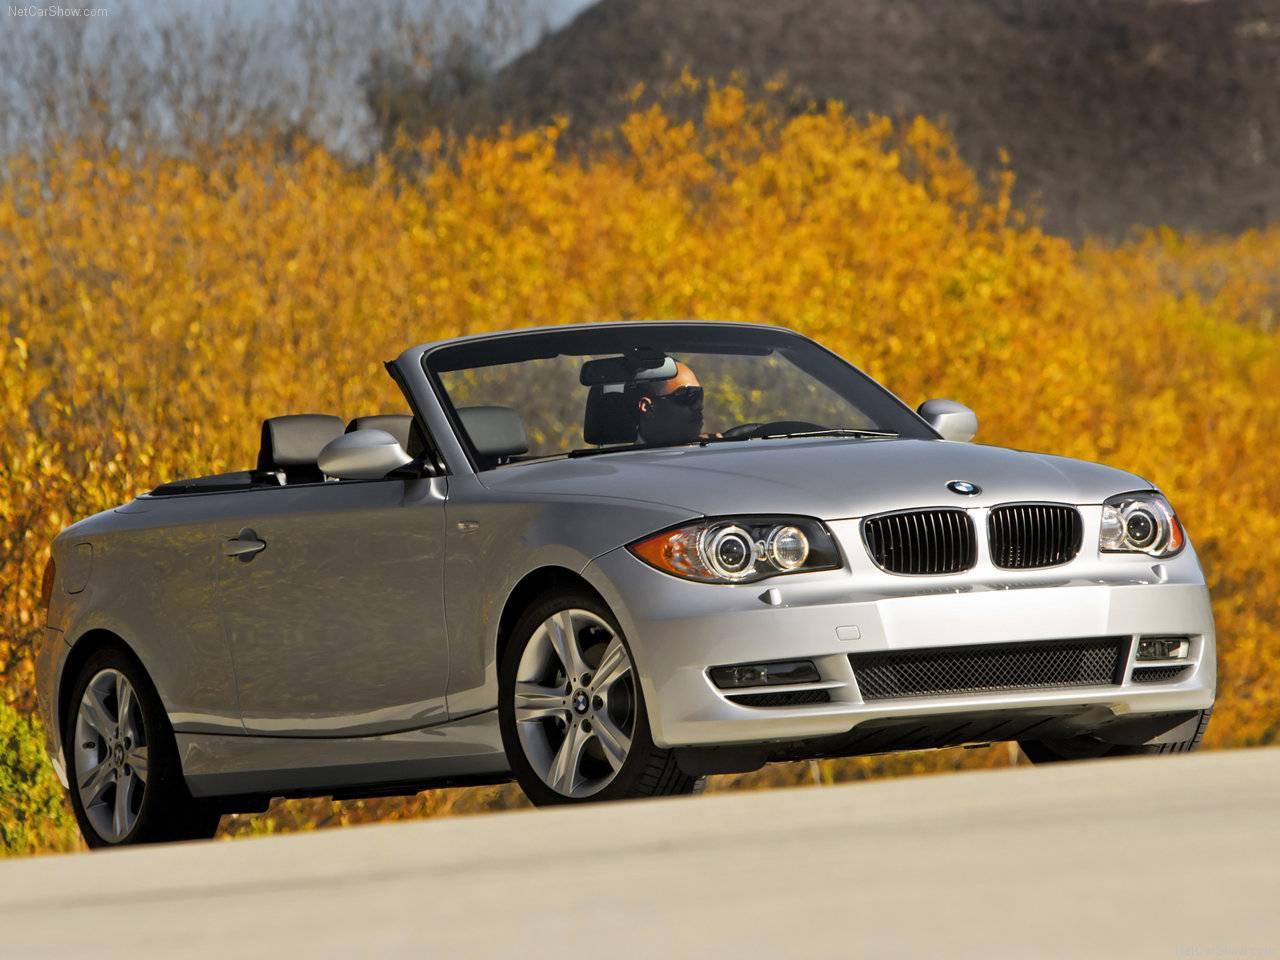 Car Pertamax 2008 Bmw 128i Convertible